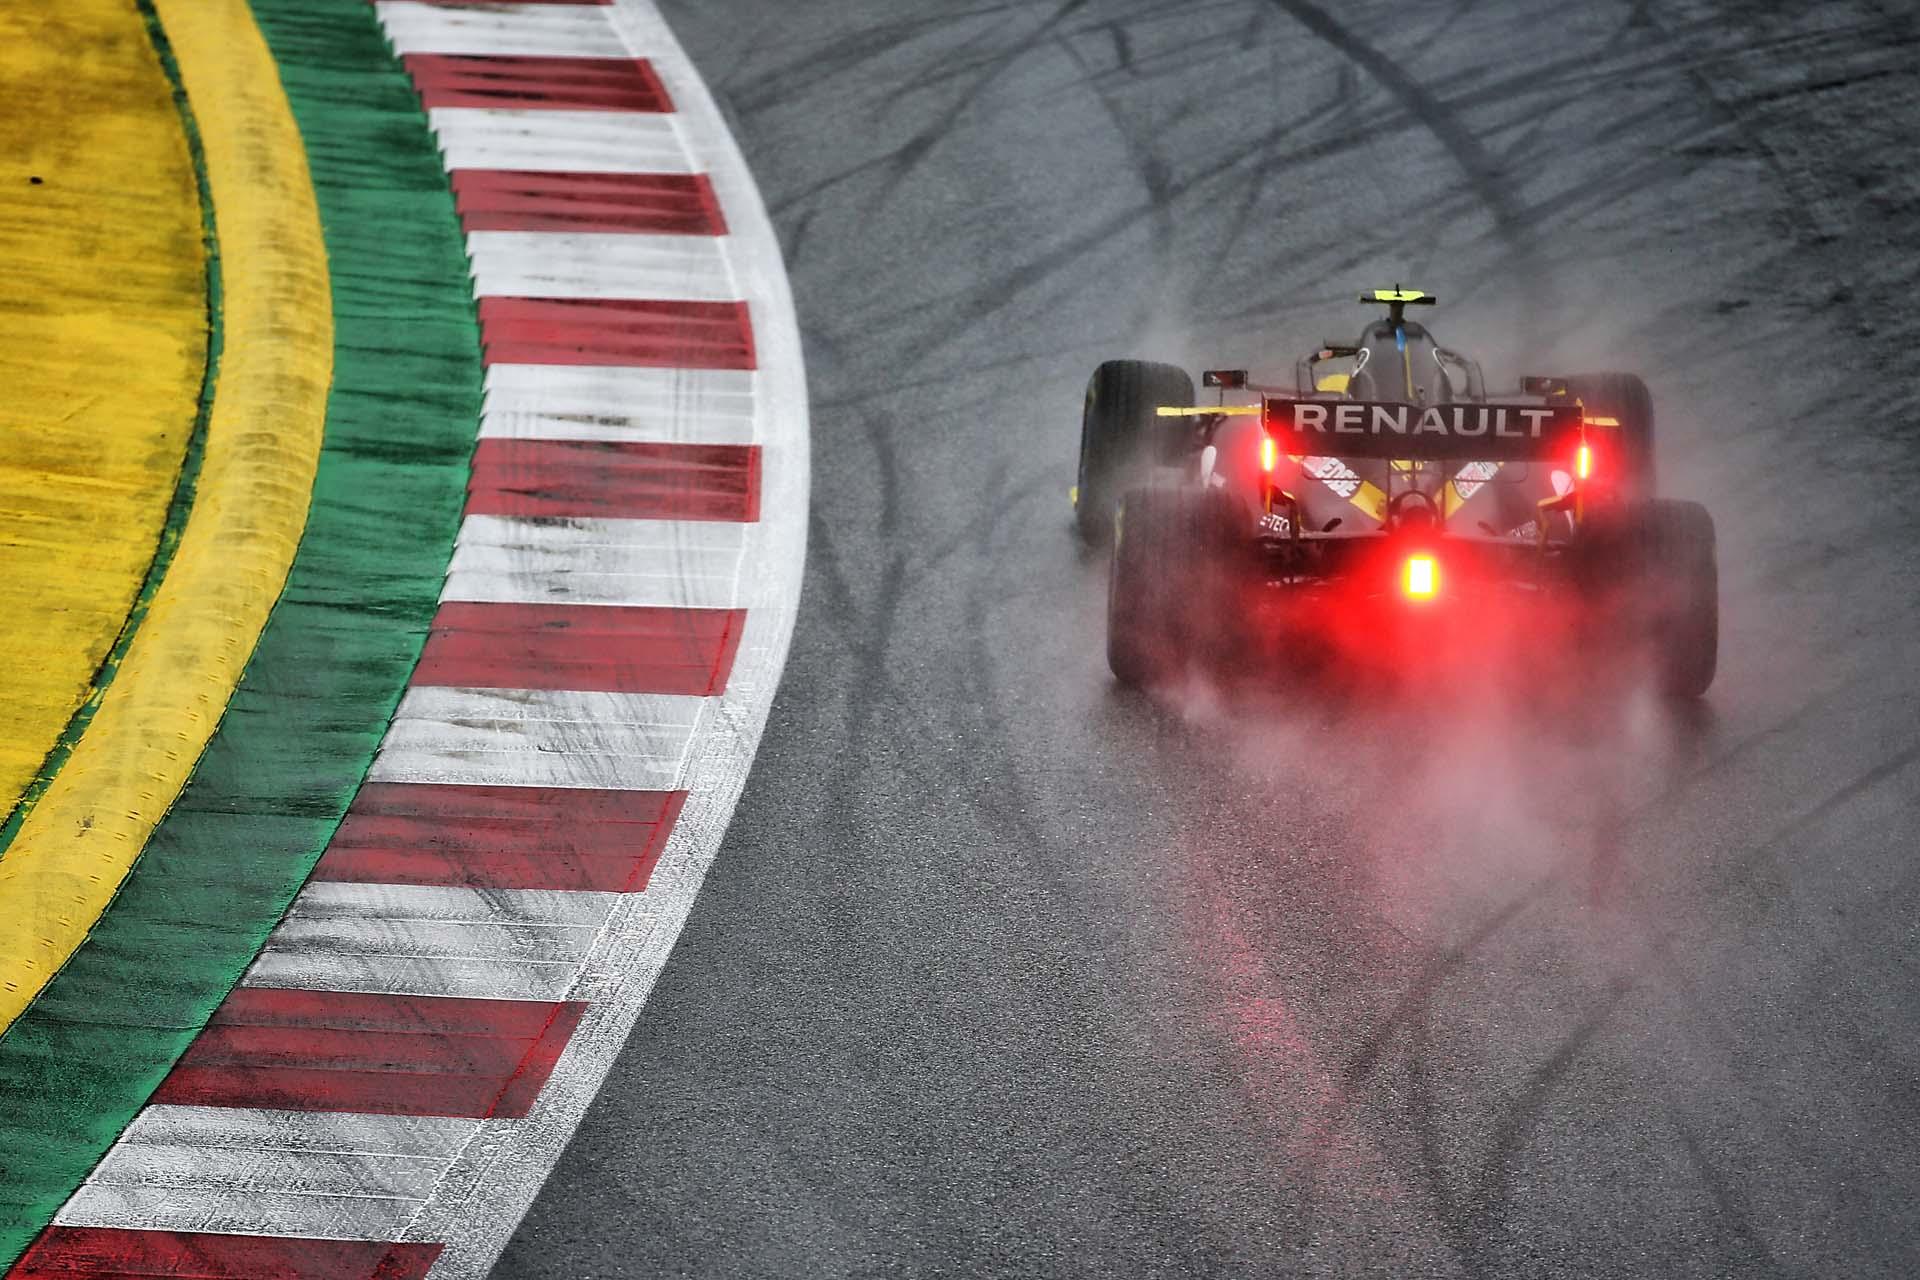 Motor Racing - Formula One World Championship - Steiermark Grand Prix - Qualifying Day - Spielberg, Austria